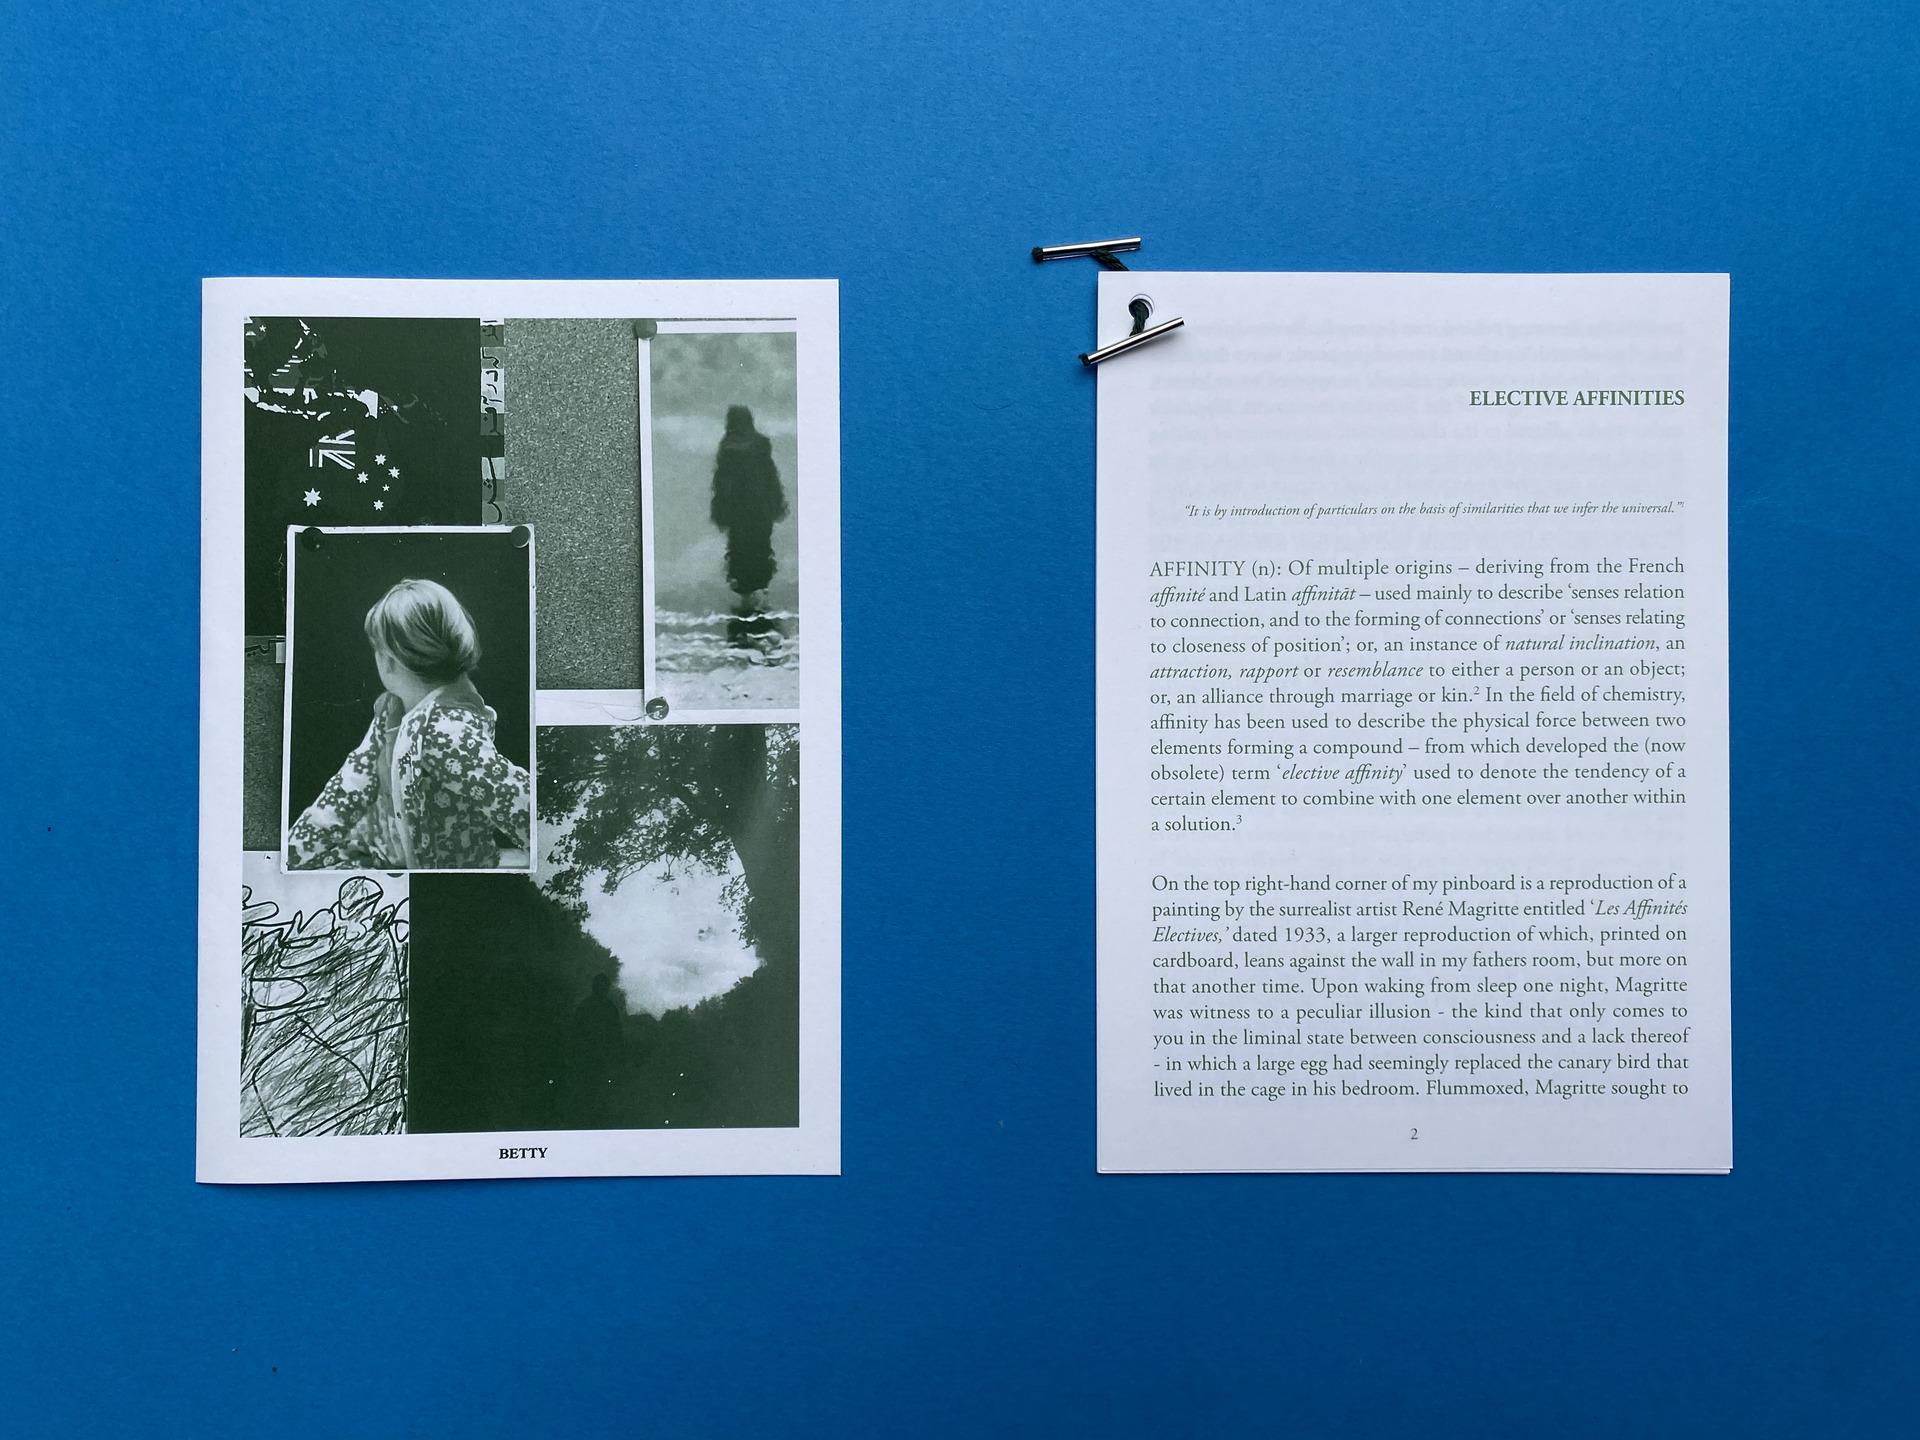 Text: Betty / Text: Elective Affinities / Postcard on pinboard: 'Betty', Gerhard Richter, 1988.